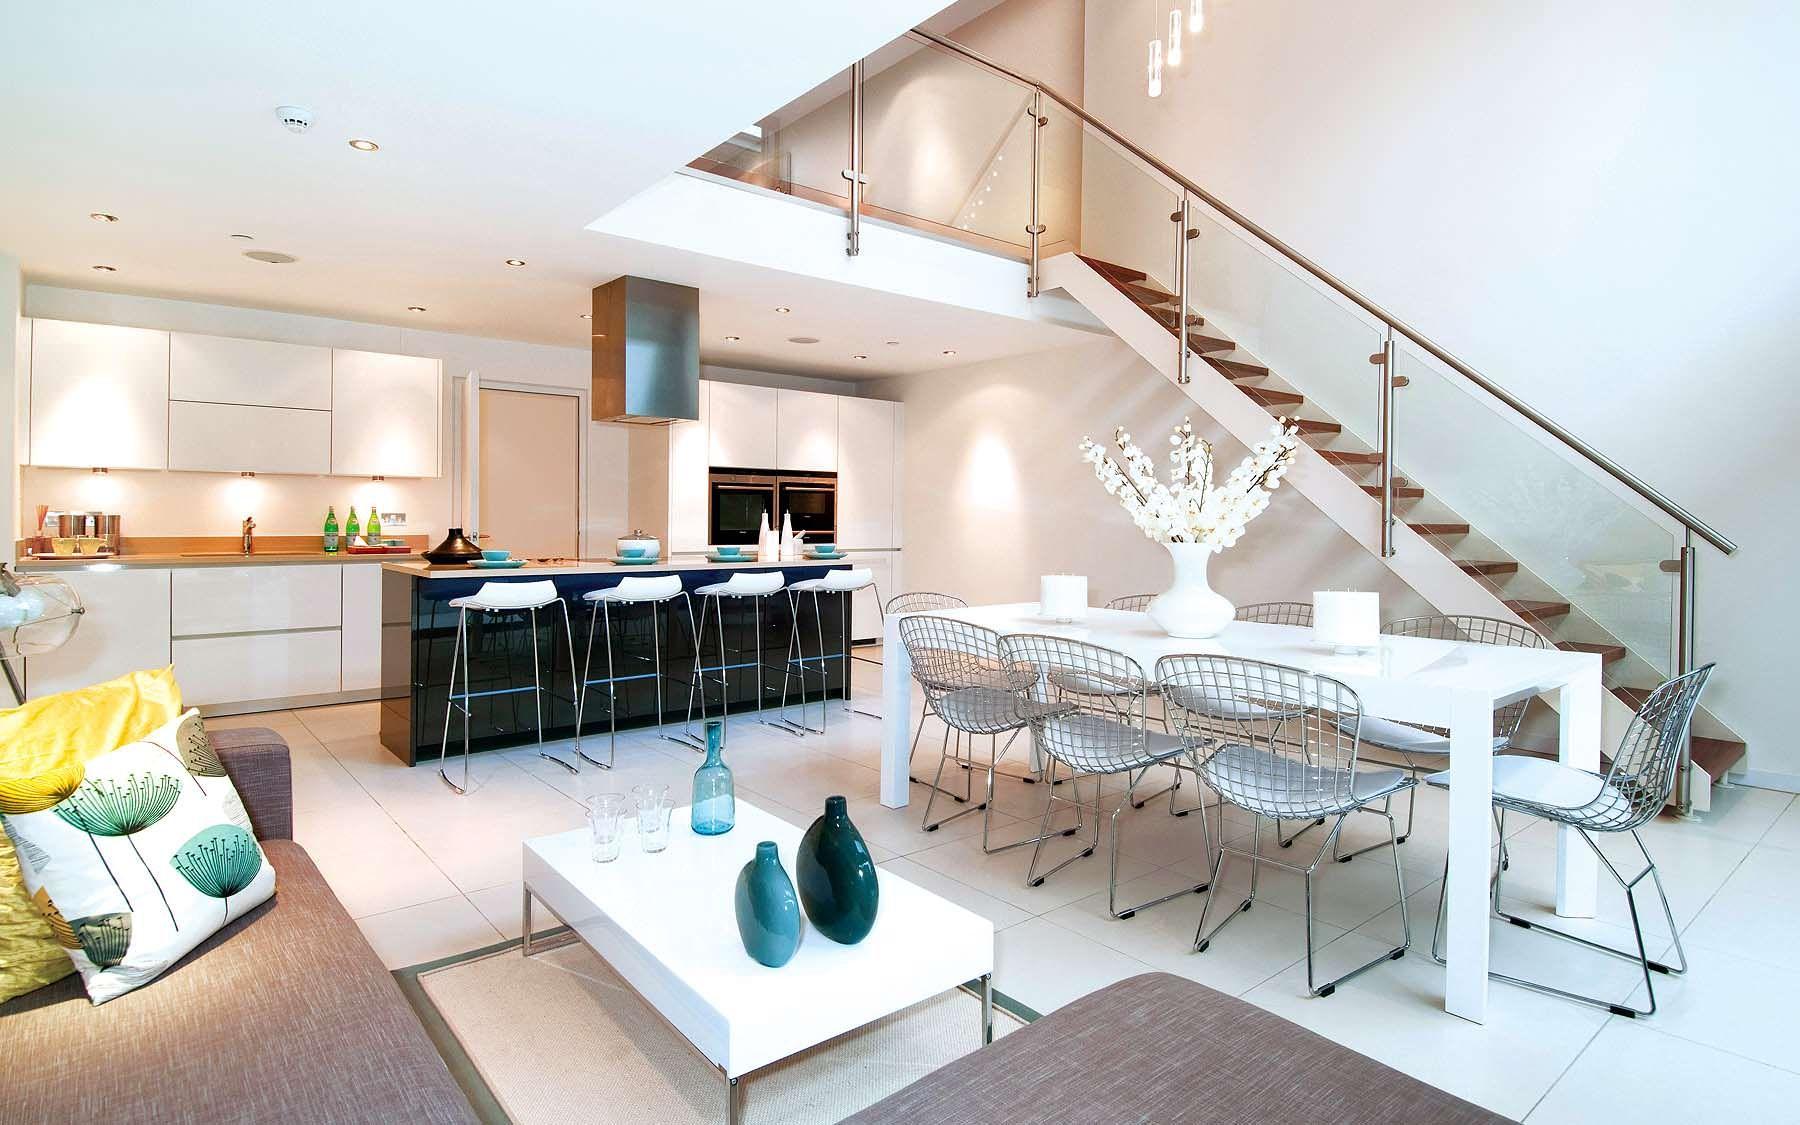 interior design for living room and kitchen - 1000+ images about Modern Interior Design on Pinterest Modern ...